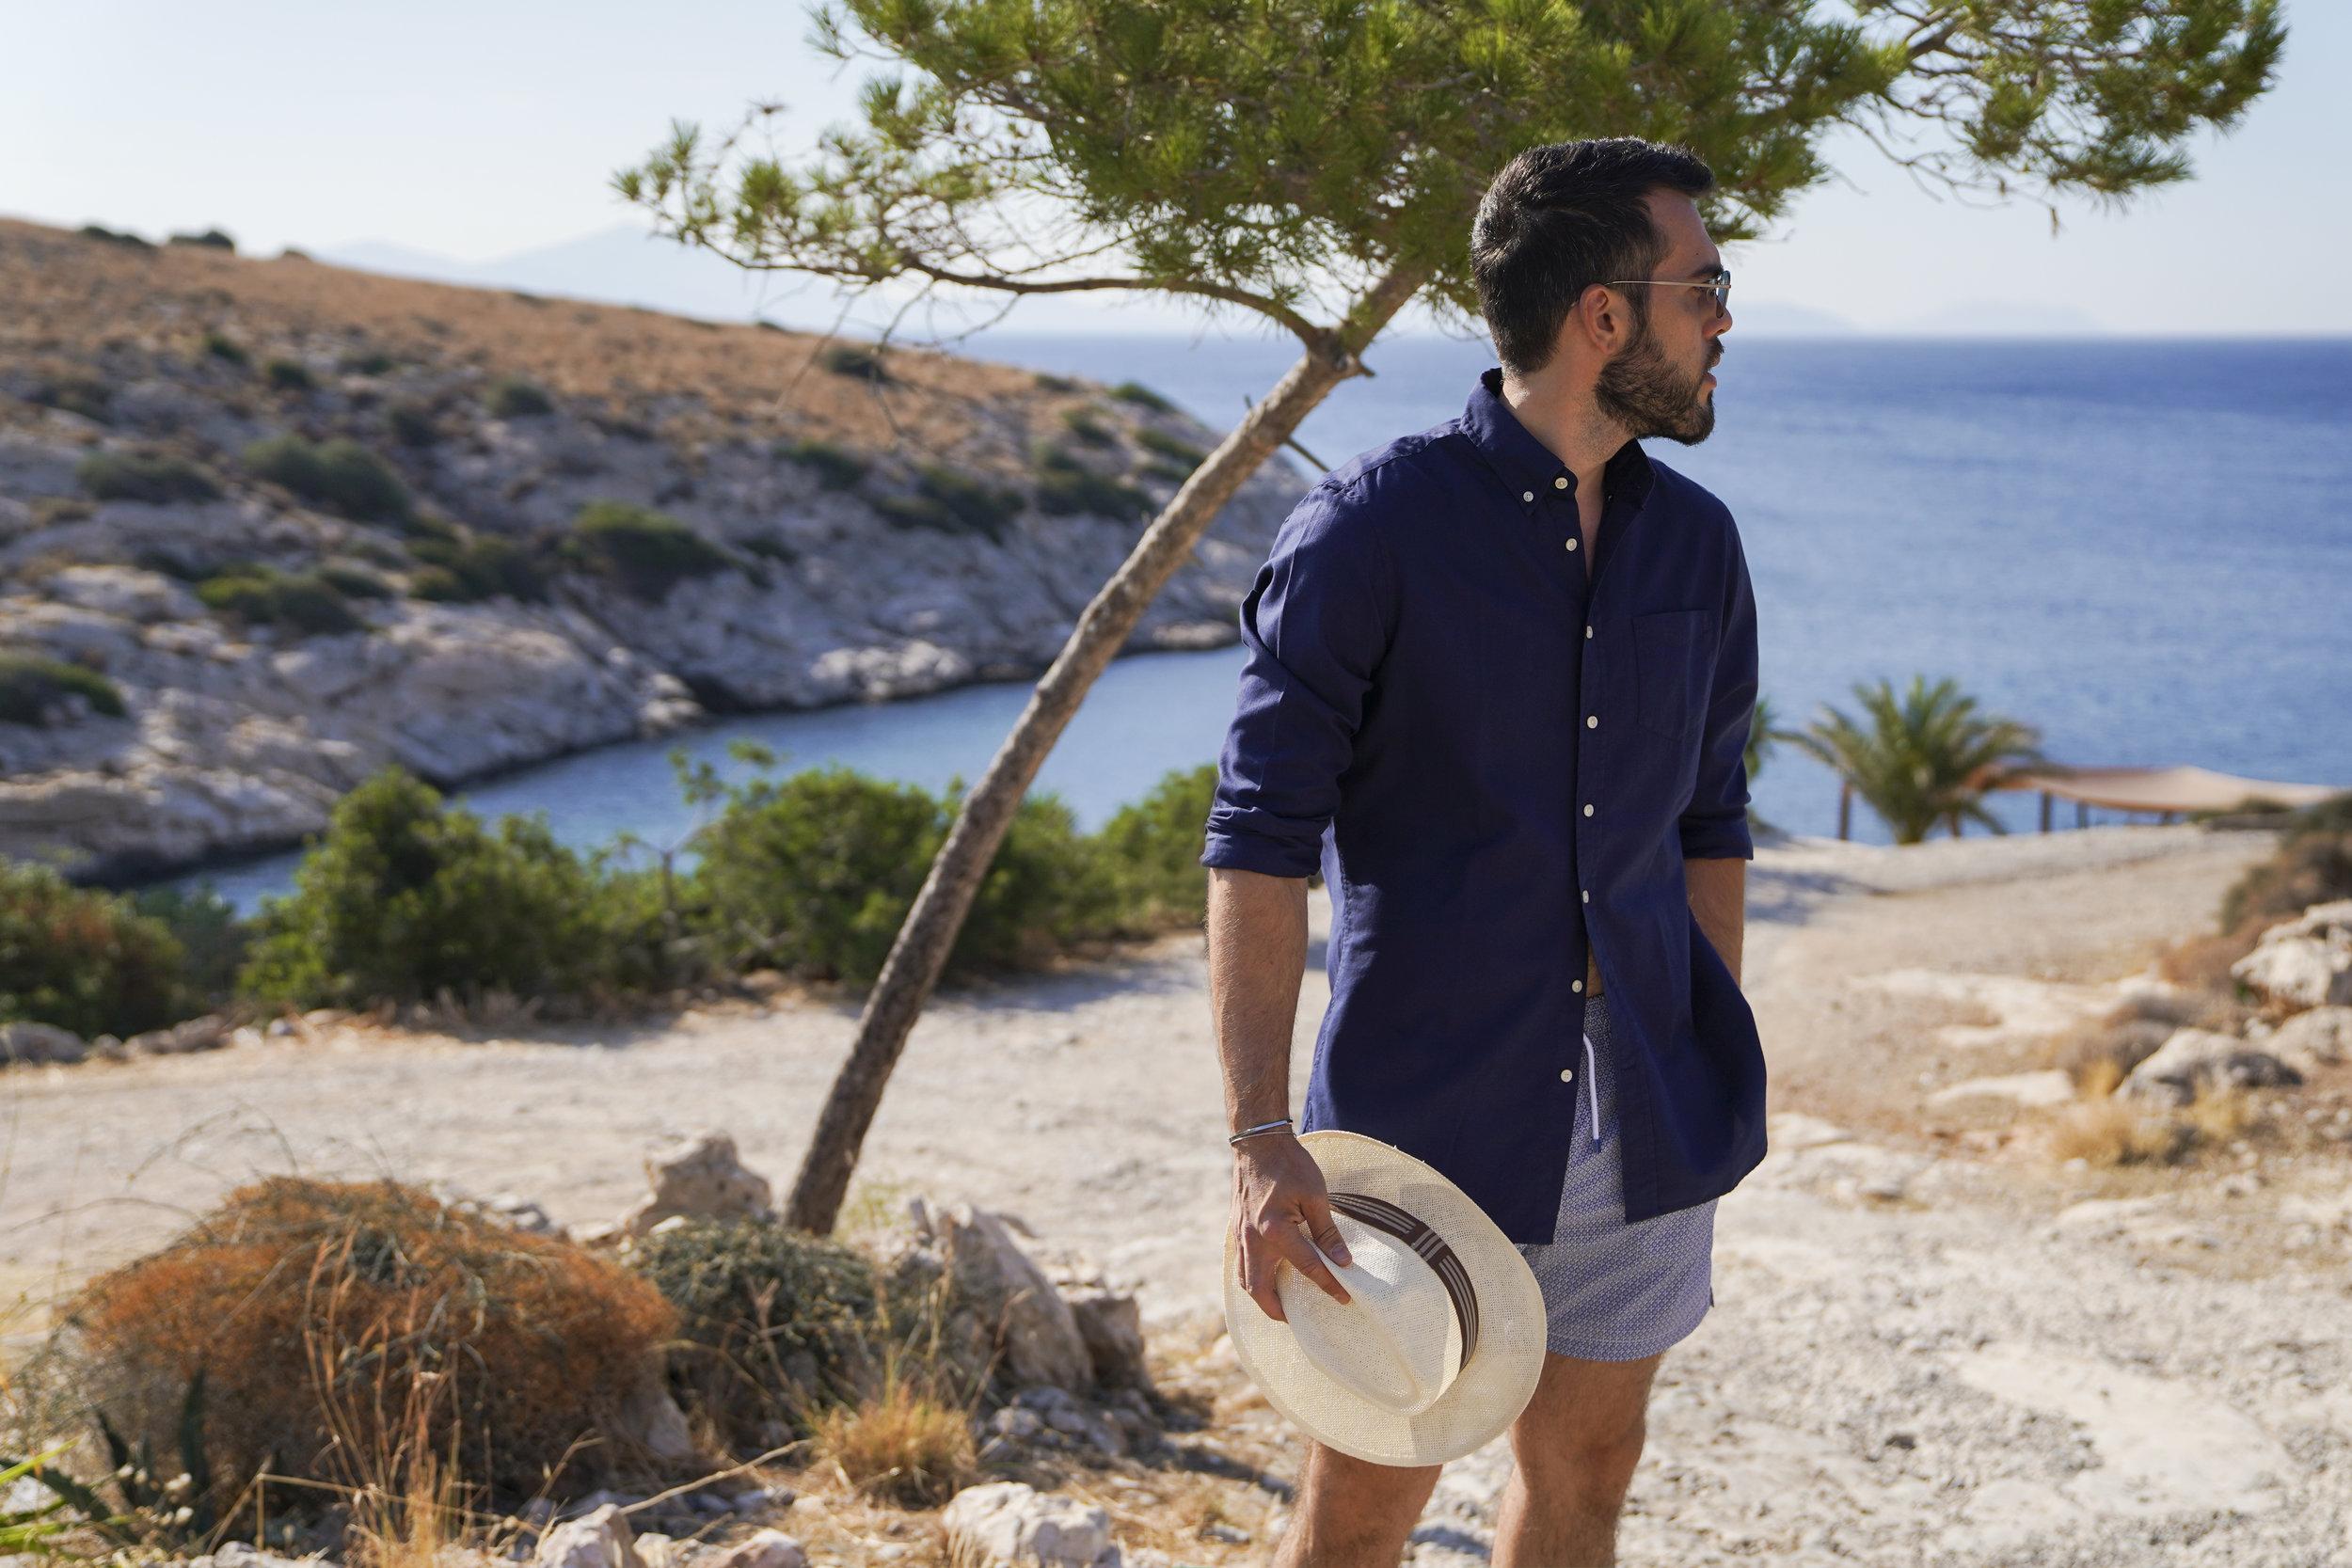 Swimsuit & Shirt: Hackett London / Sunglasses: Tomas Maier